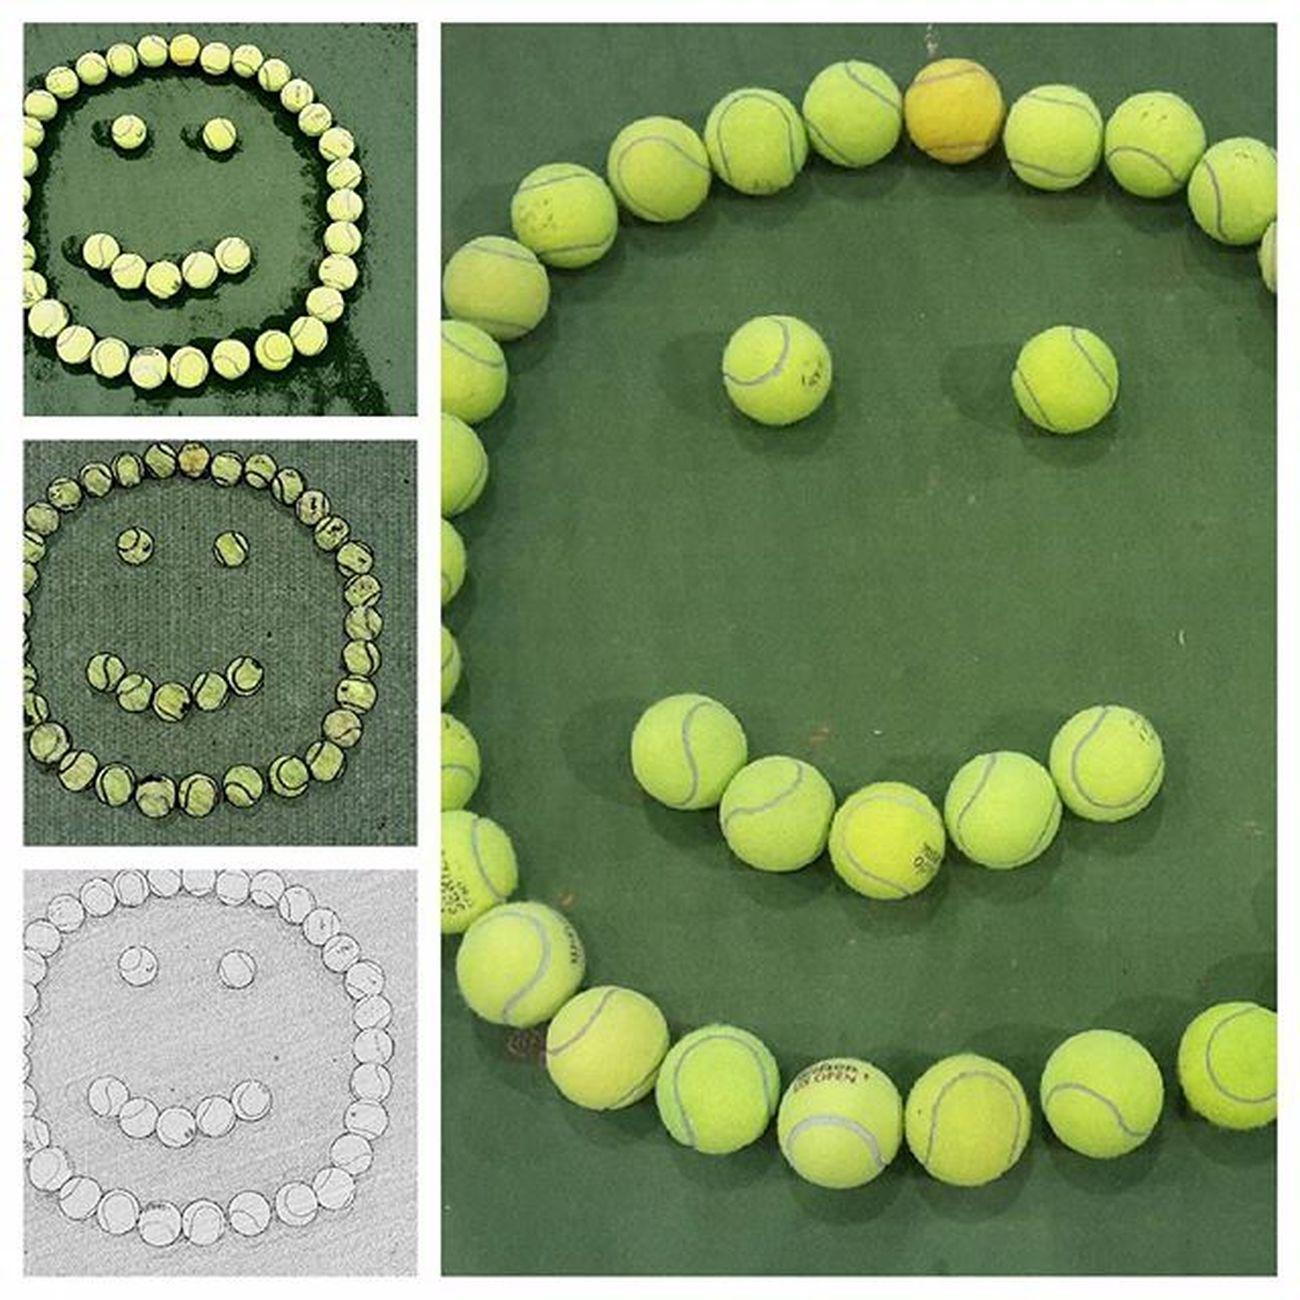 Tenis Relax Idemjakfederer